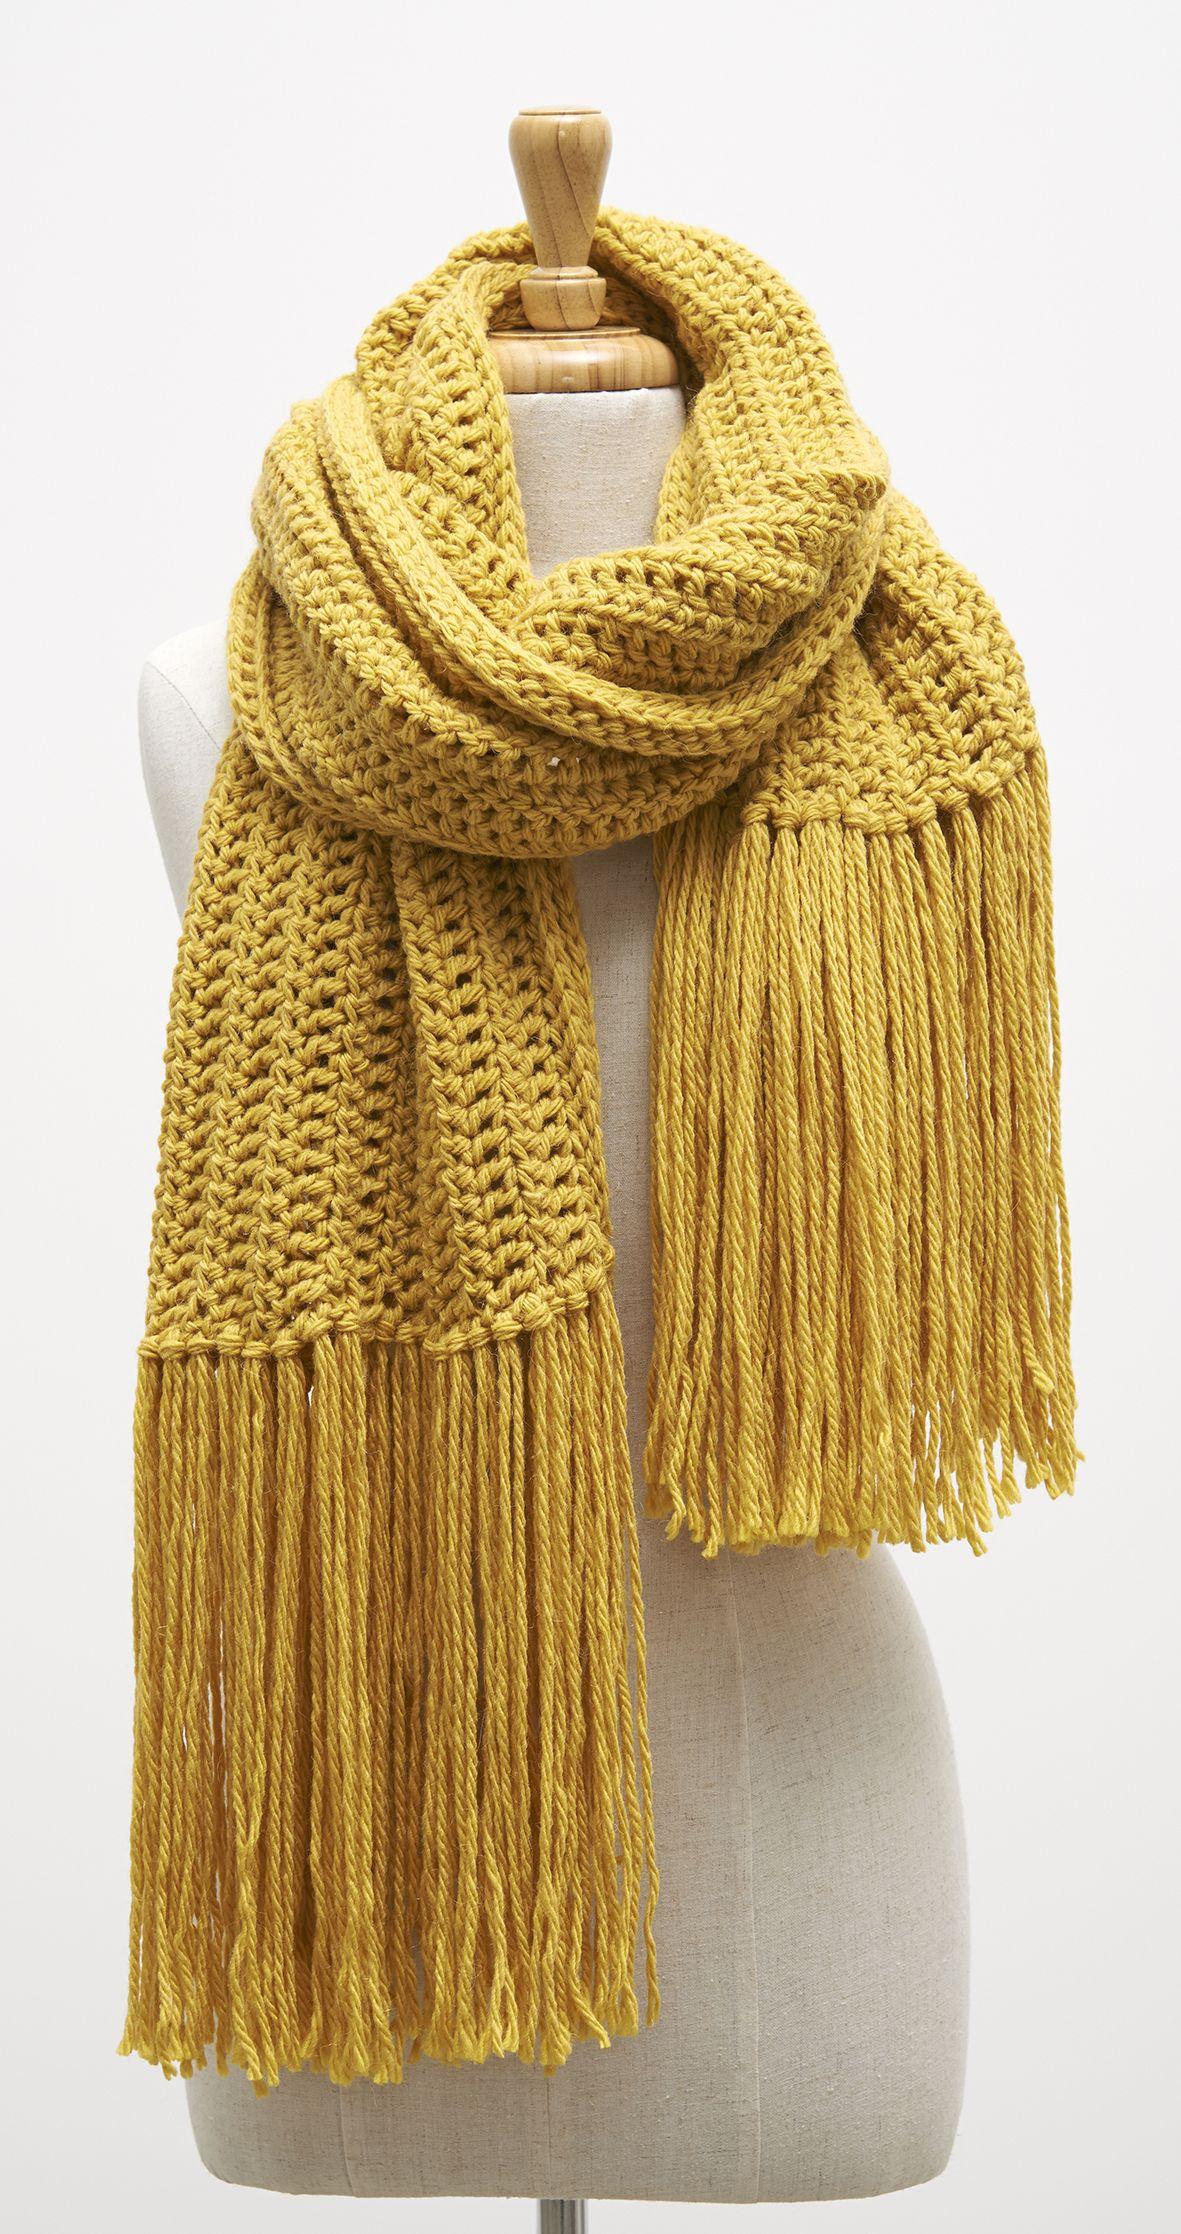 Crochet Scarf By Patons Australia New From Acs Crochet Hand